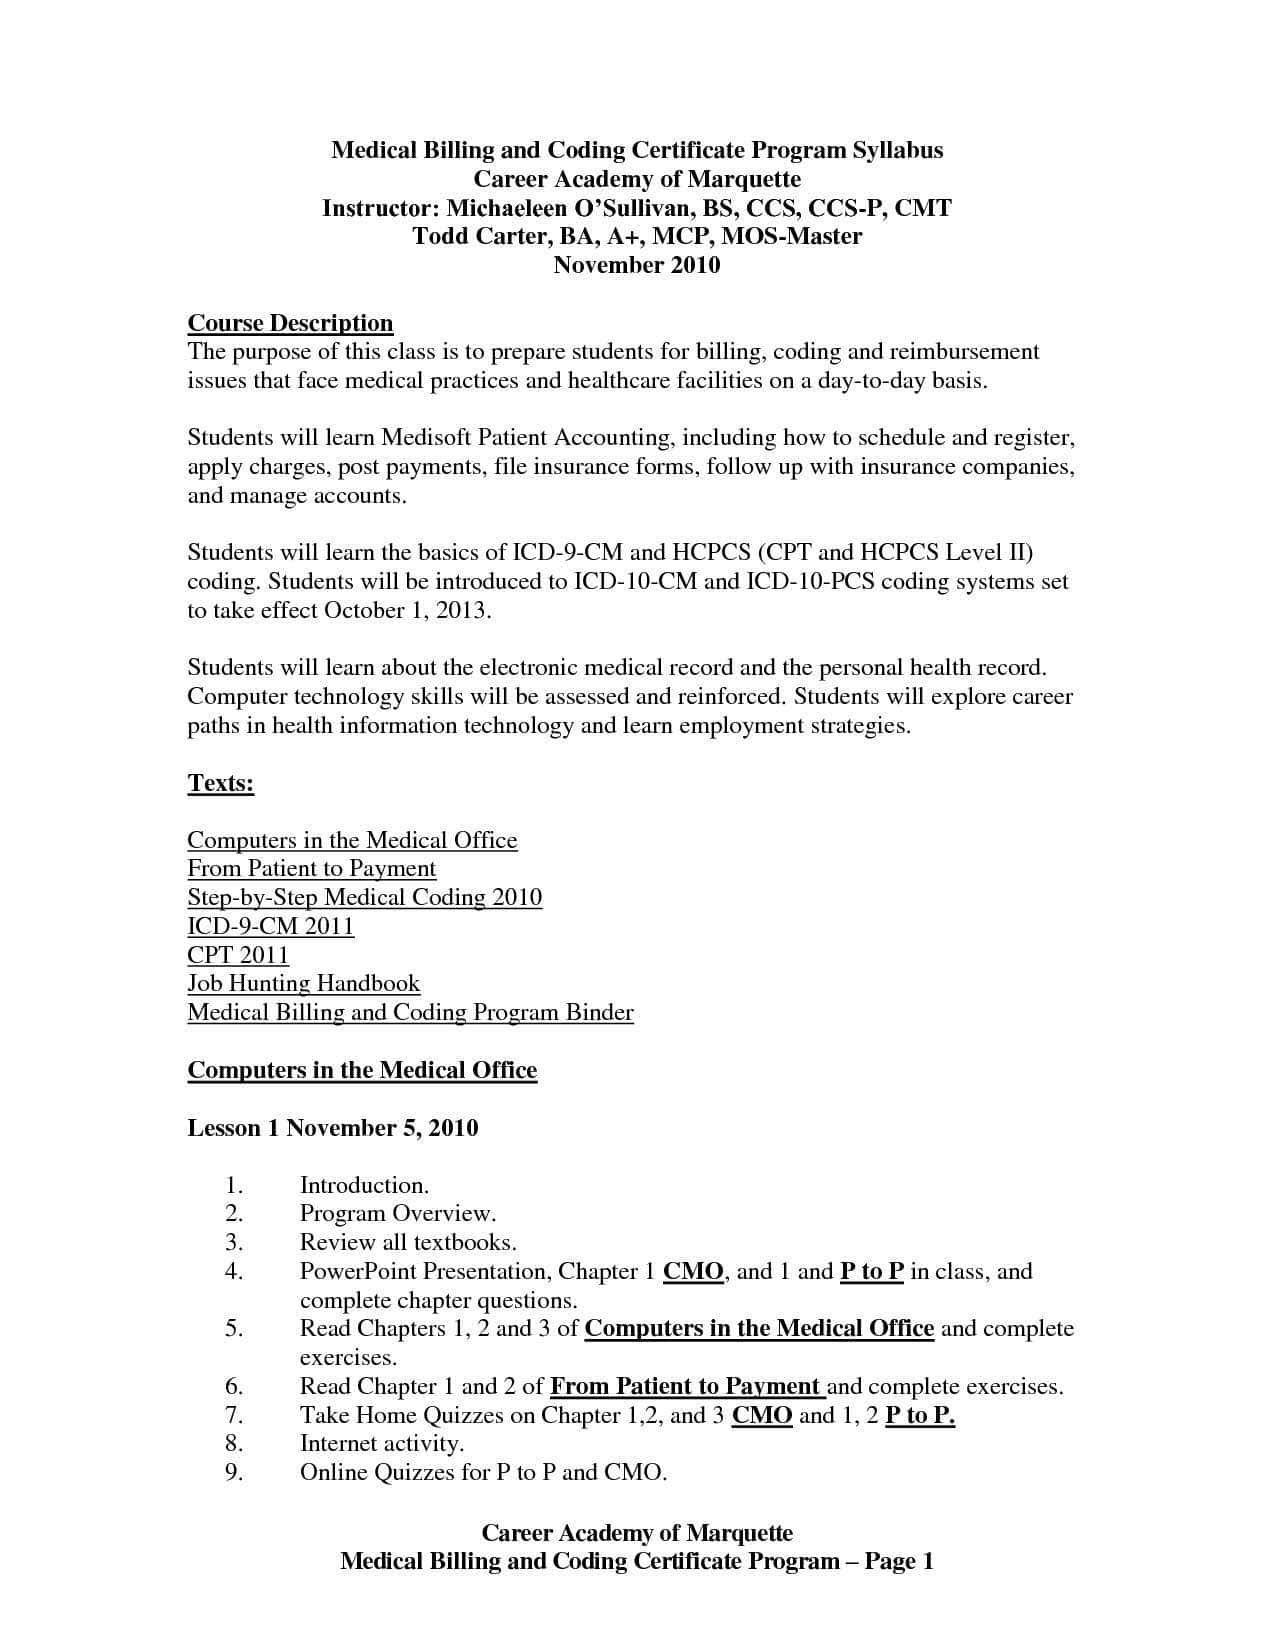 Sample Resume For Medical Billing Specialist in 2020